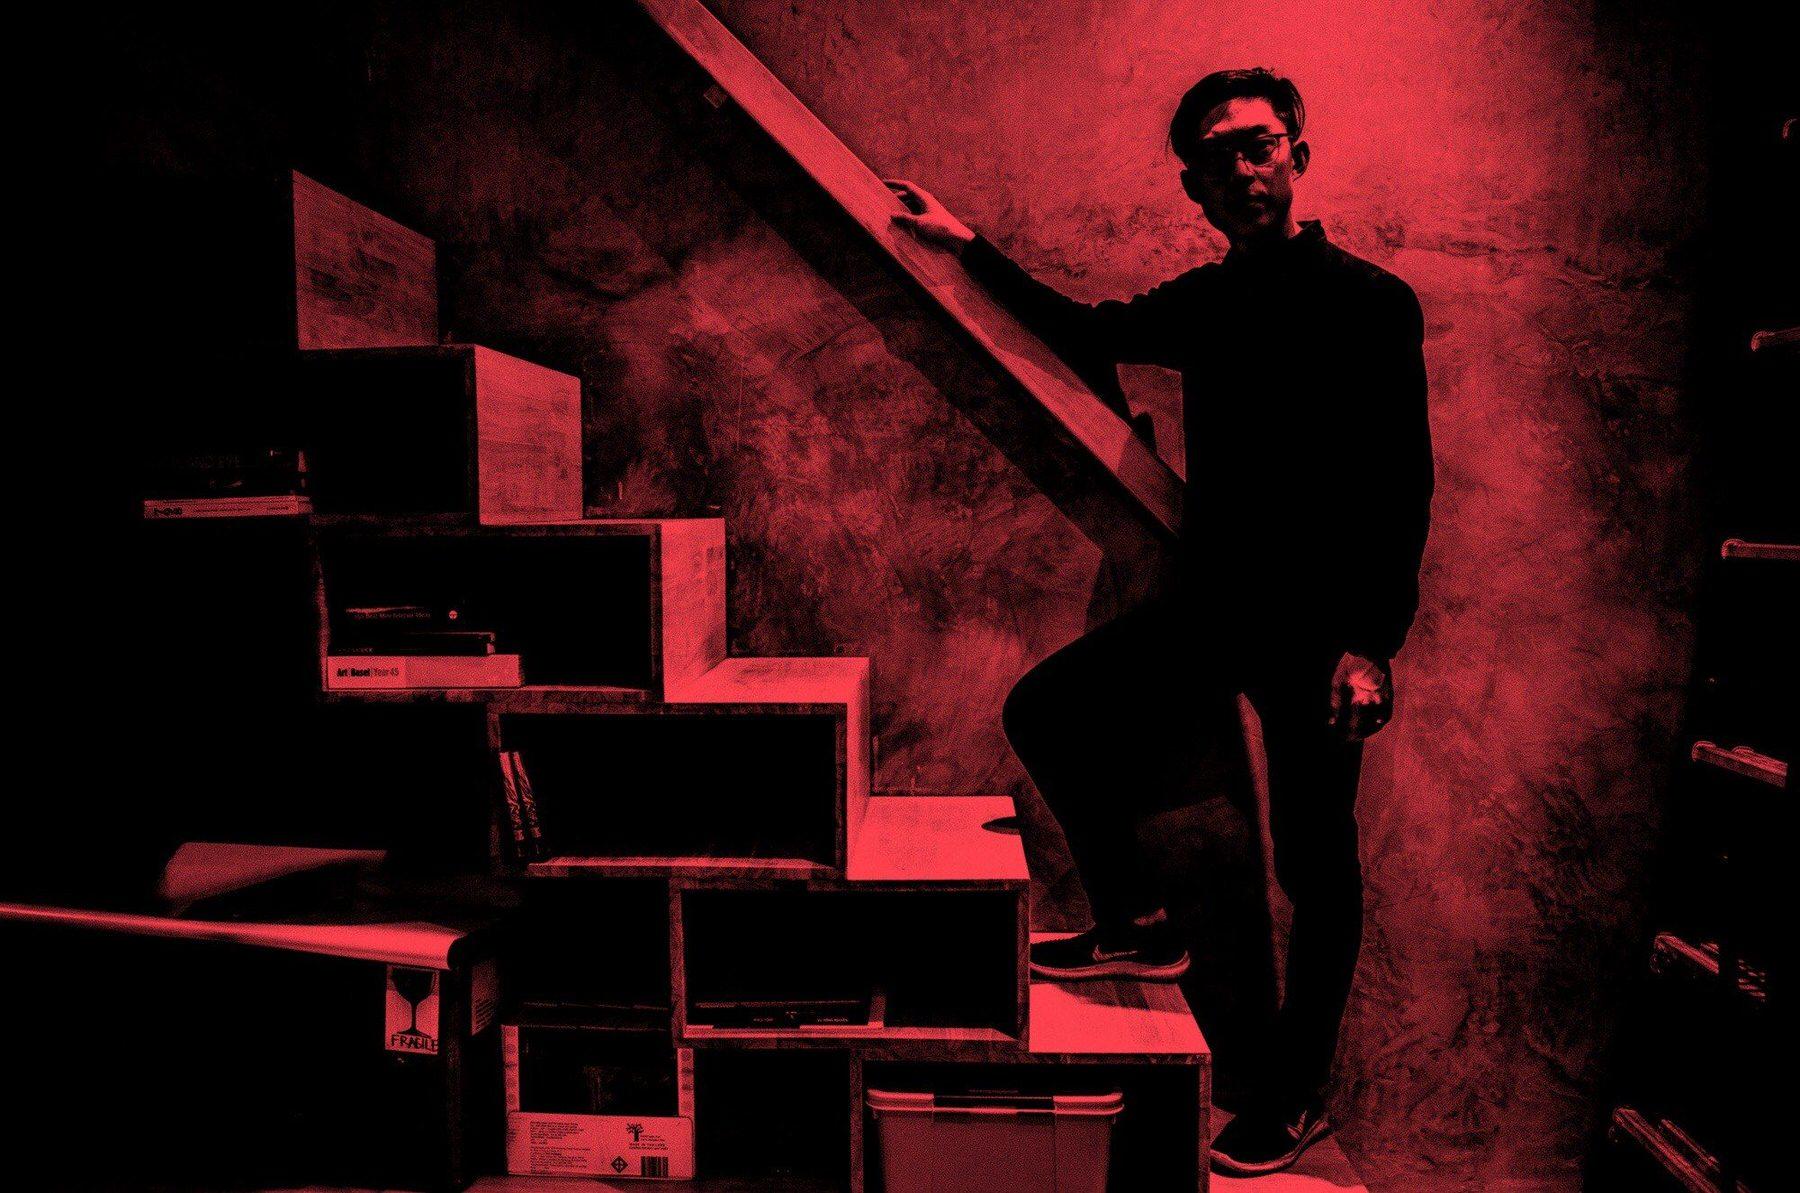 eric-kim-hanoi-vui-red-2000x1325-1.jpg